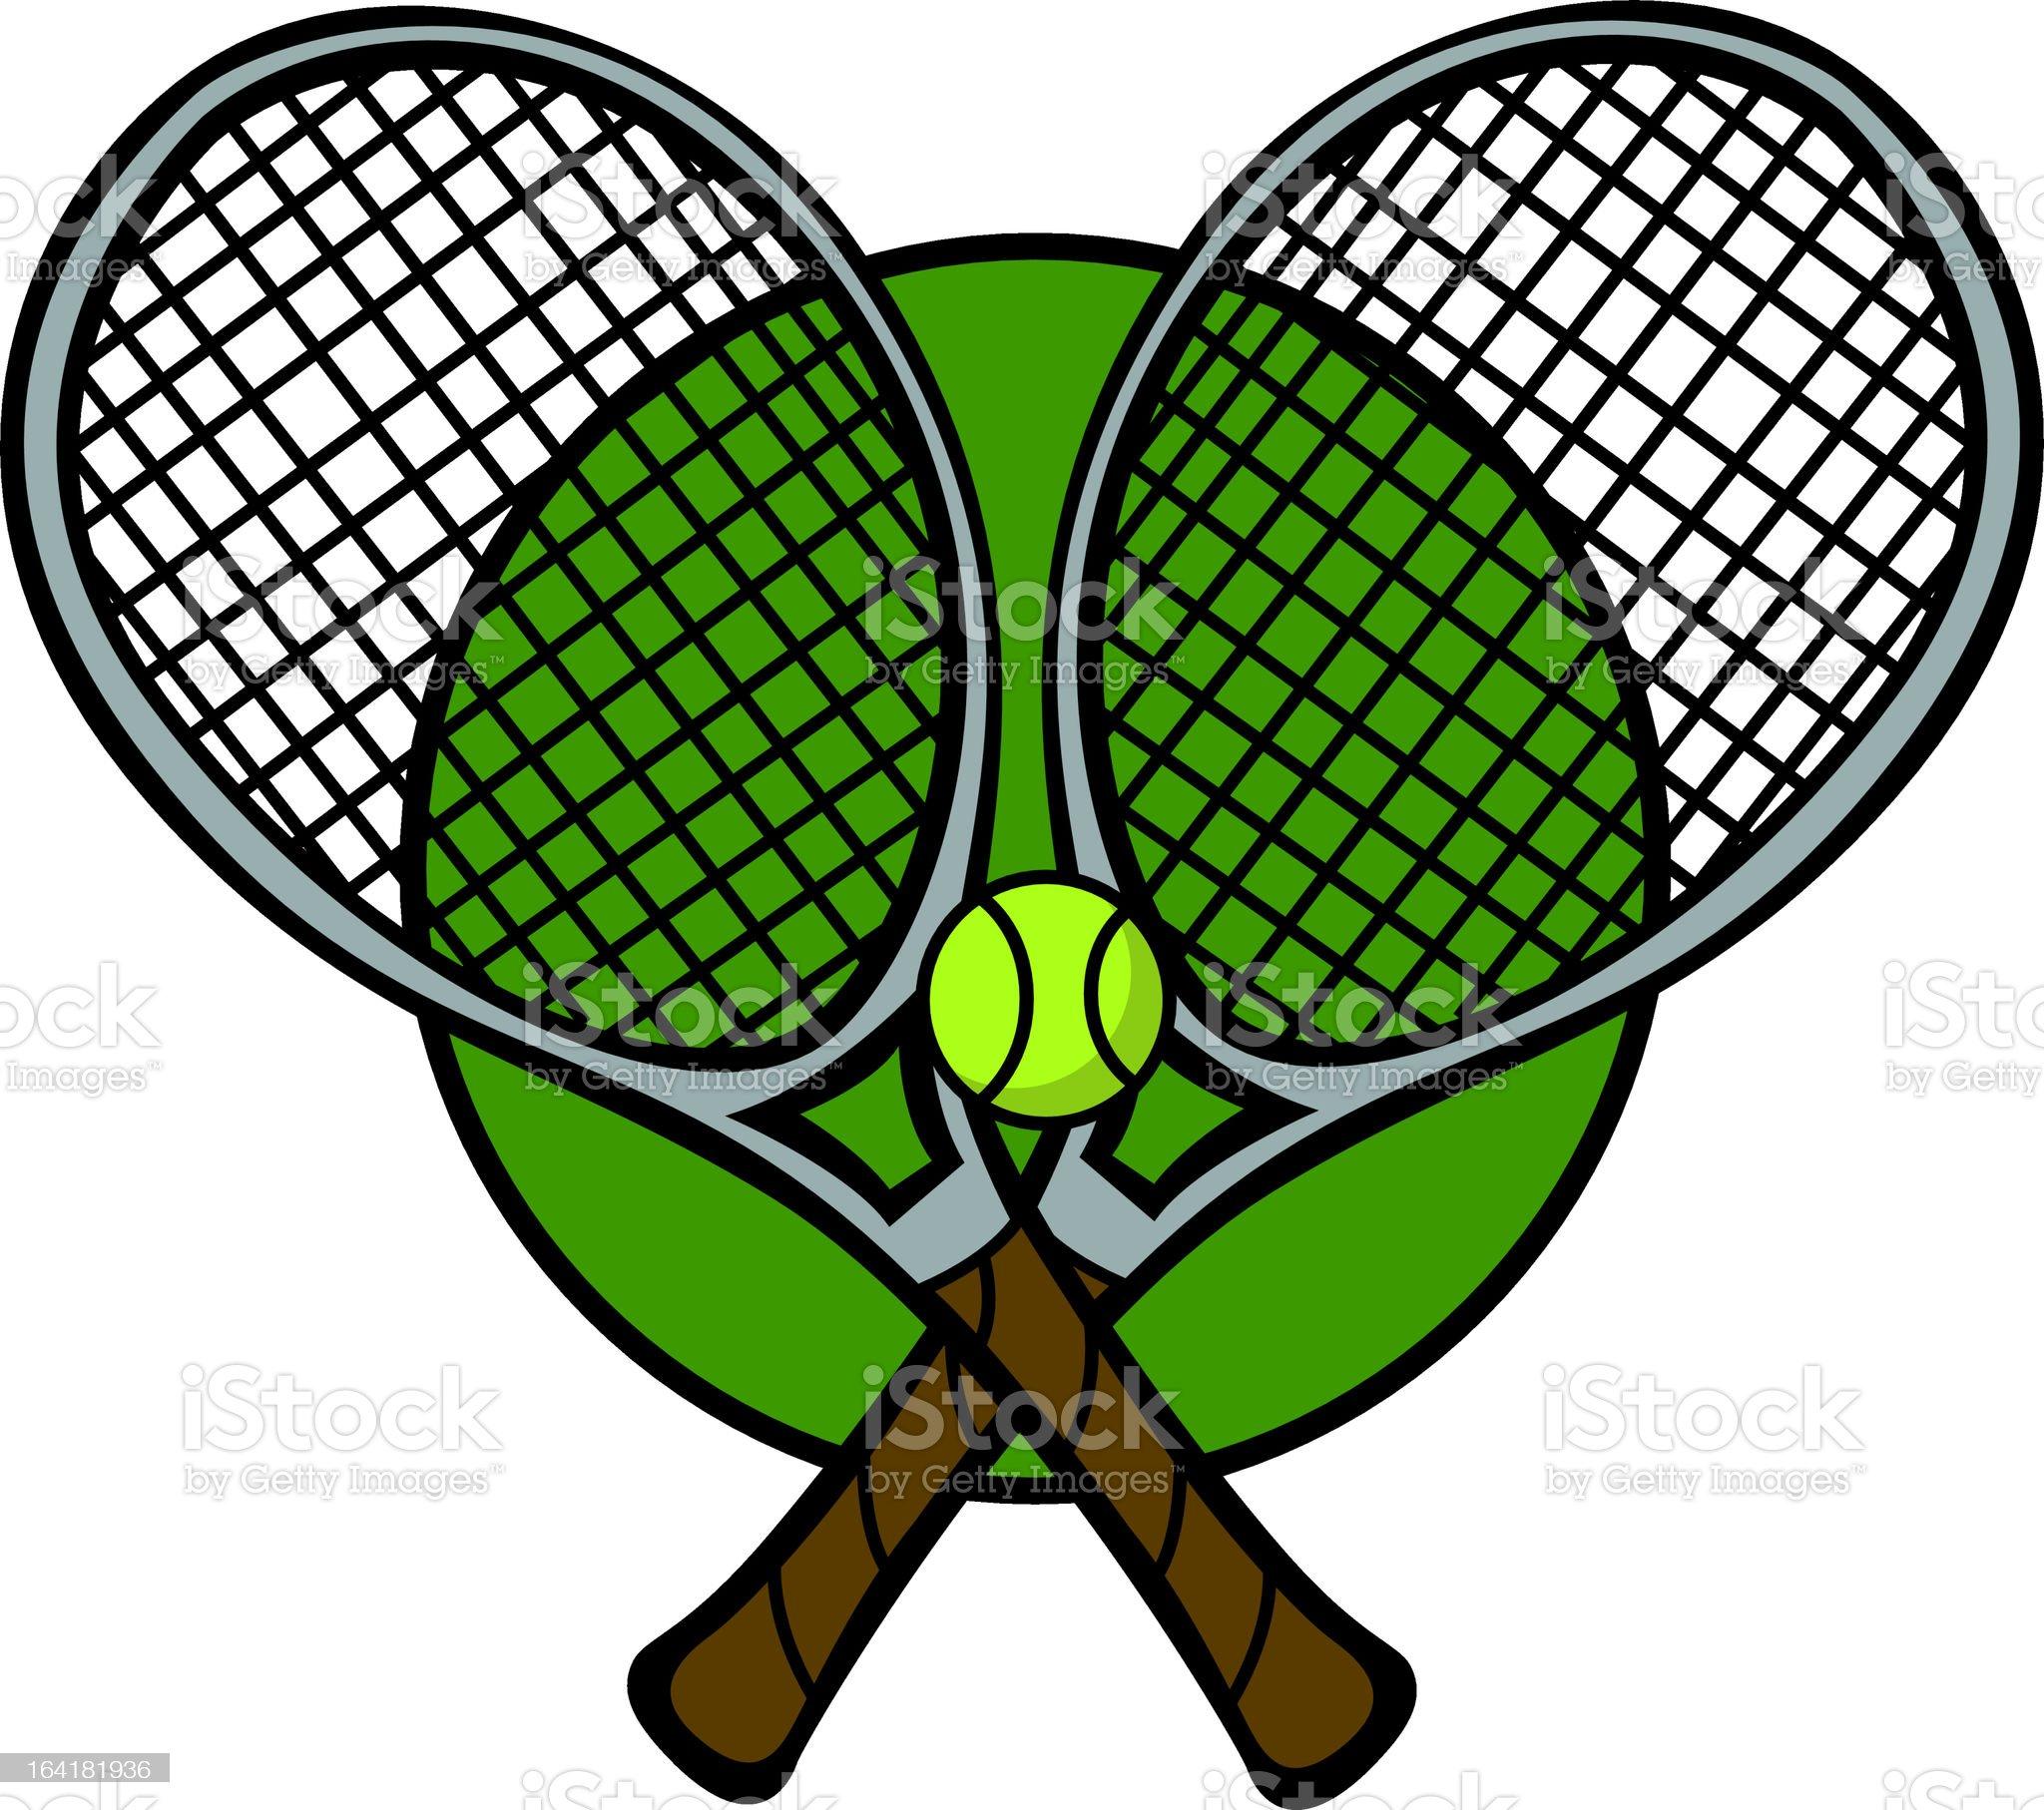 tennis rackets royalty-free stock vector art